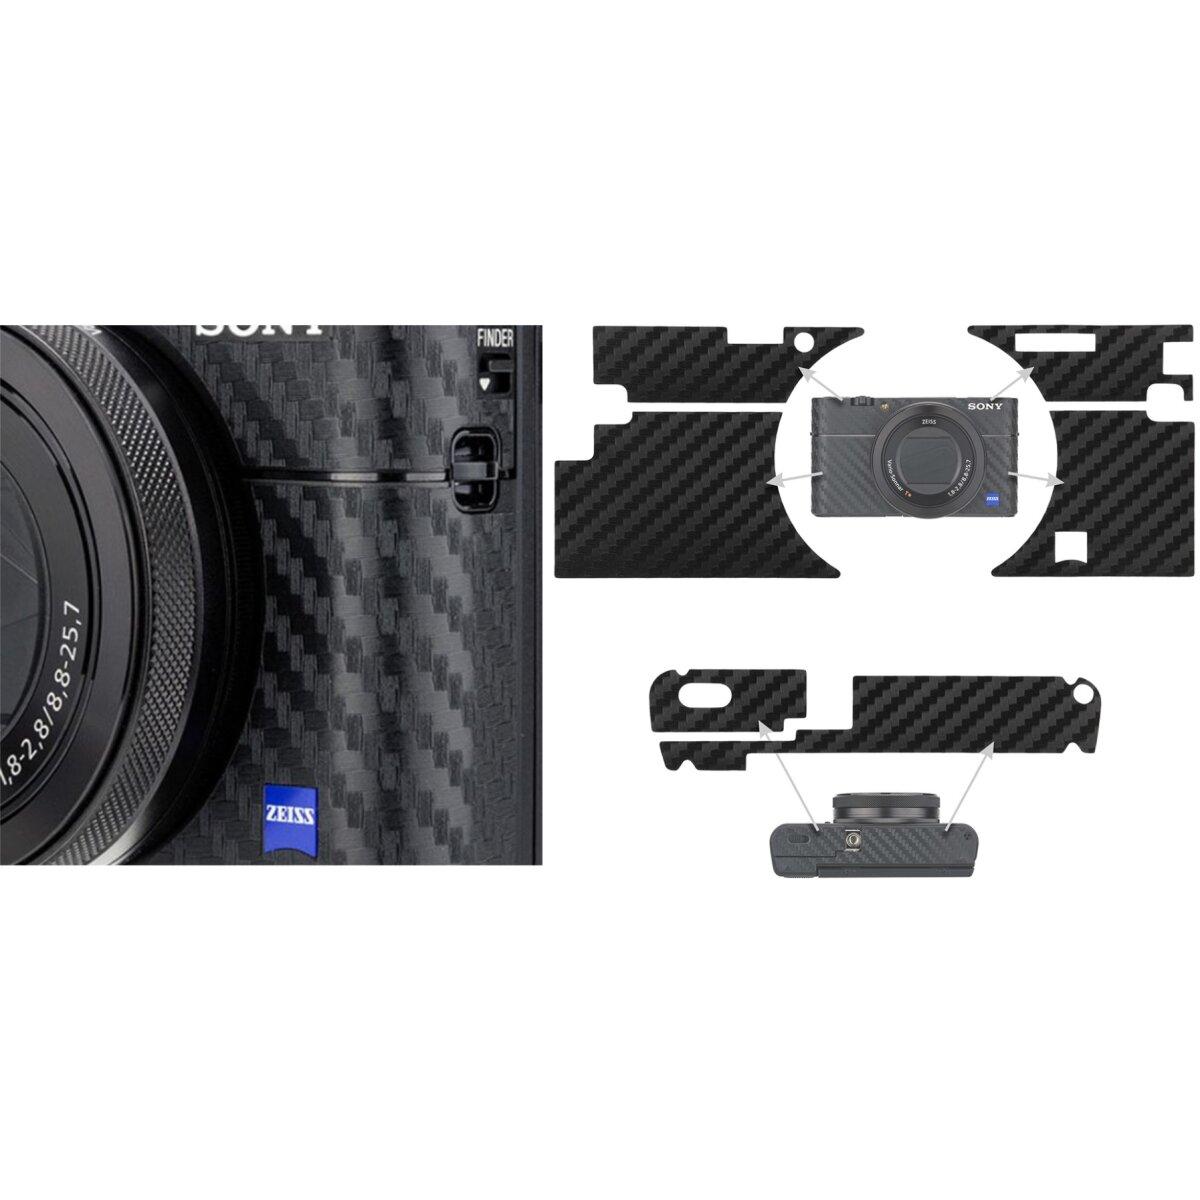 Impulsfoto KIWIFOTOS Anti-Kratzer-Schutzfolie   Kohlefaserstruktur   Besserer Grip   Hochwertiges 3M-Material   Kompatibel für Sony RX100 V, RX100 VA, RX100 III   Modell: KS-RX100VCF